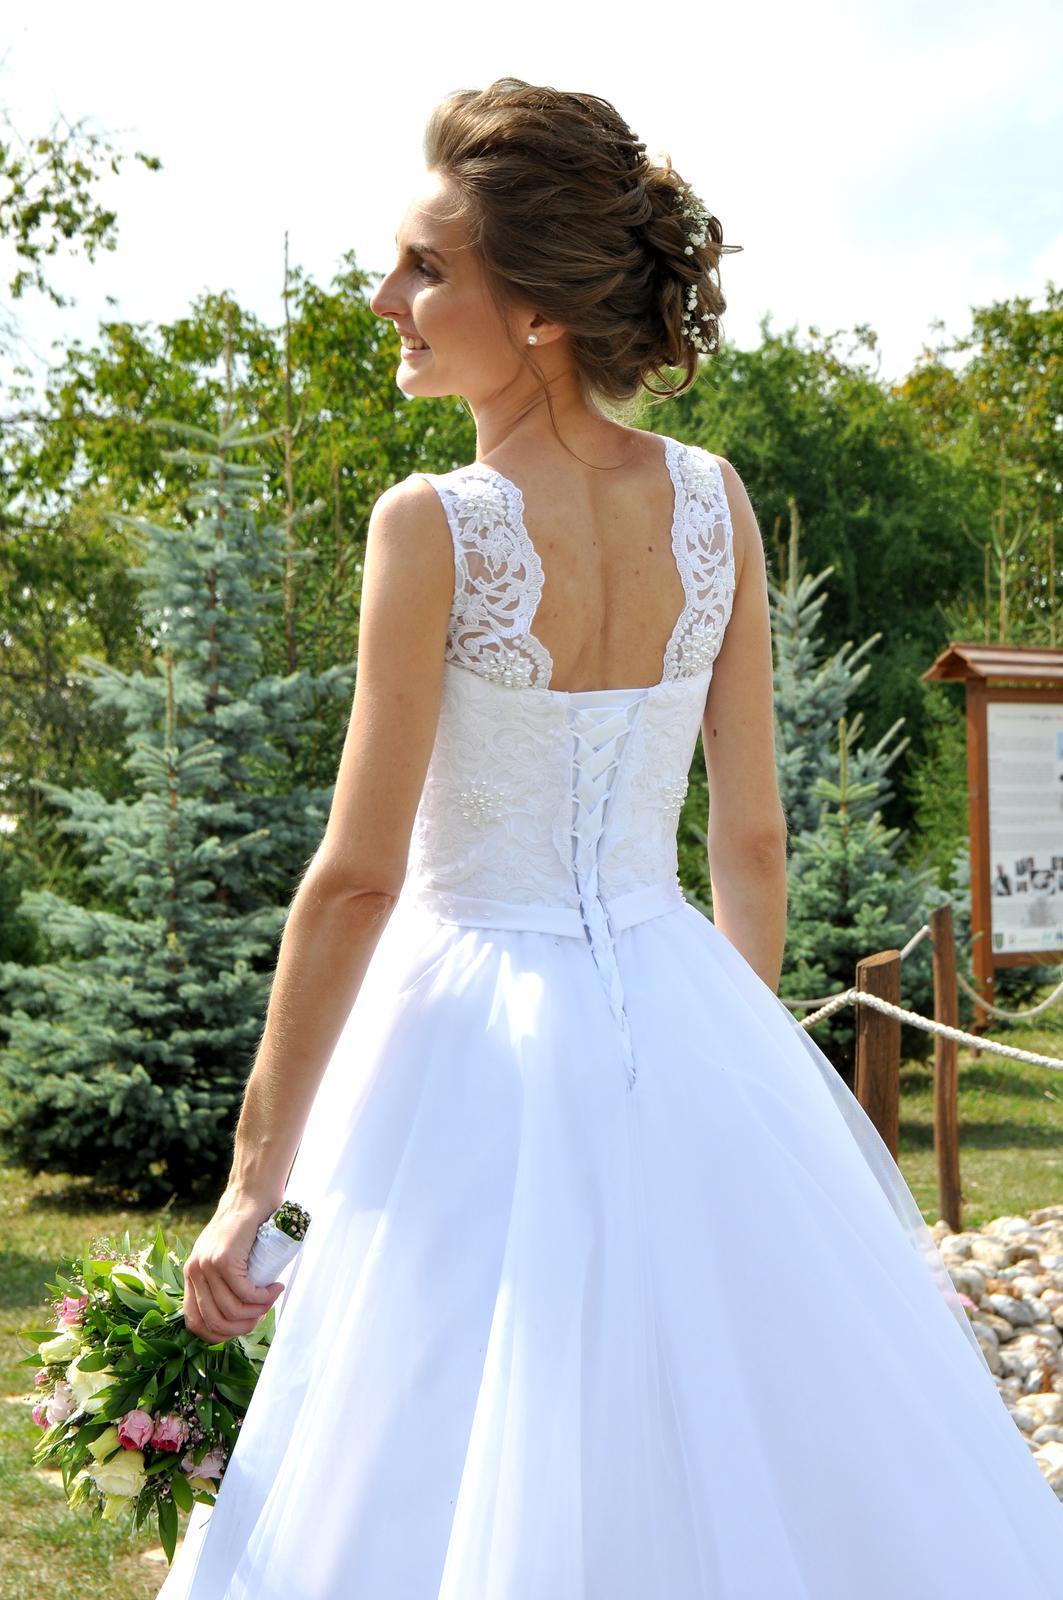 Svadobné šaty - vel.32 - Obrázok č. 3